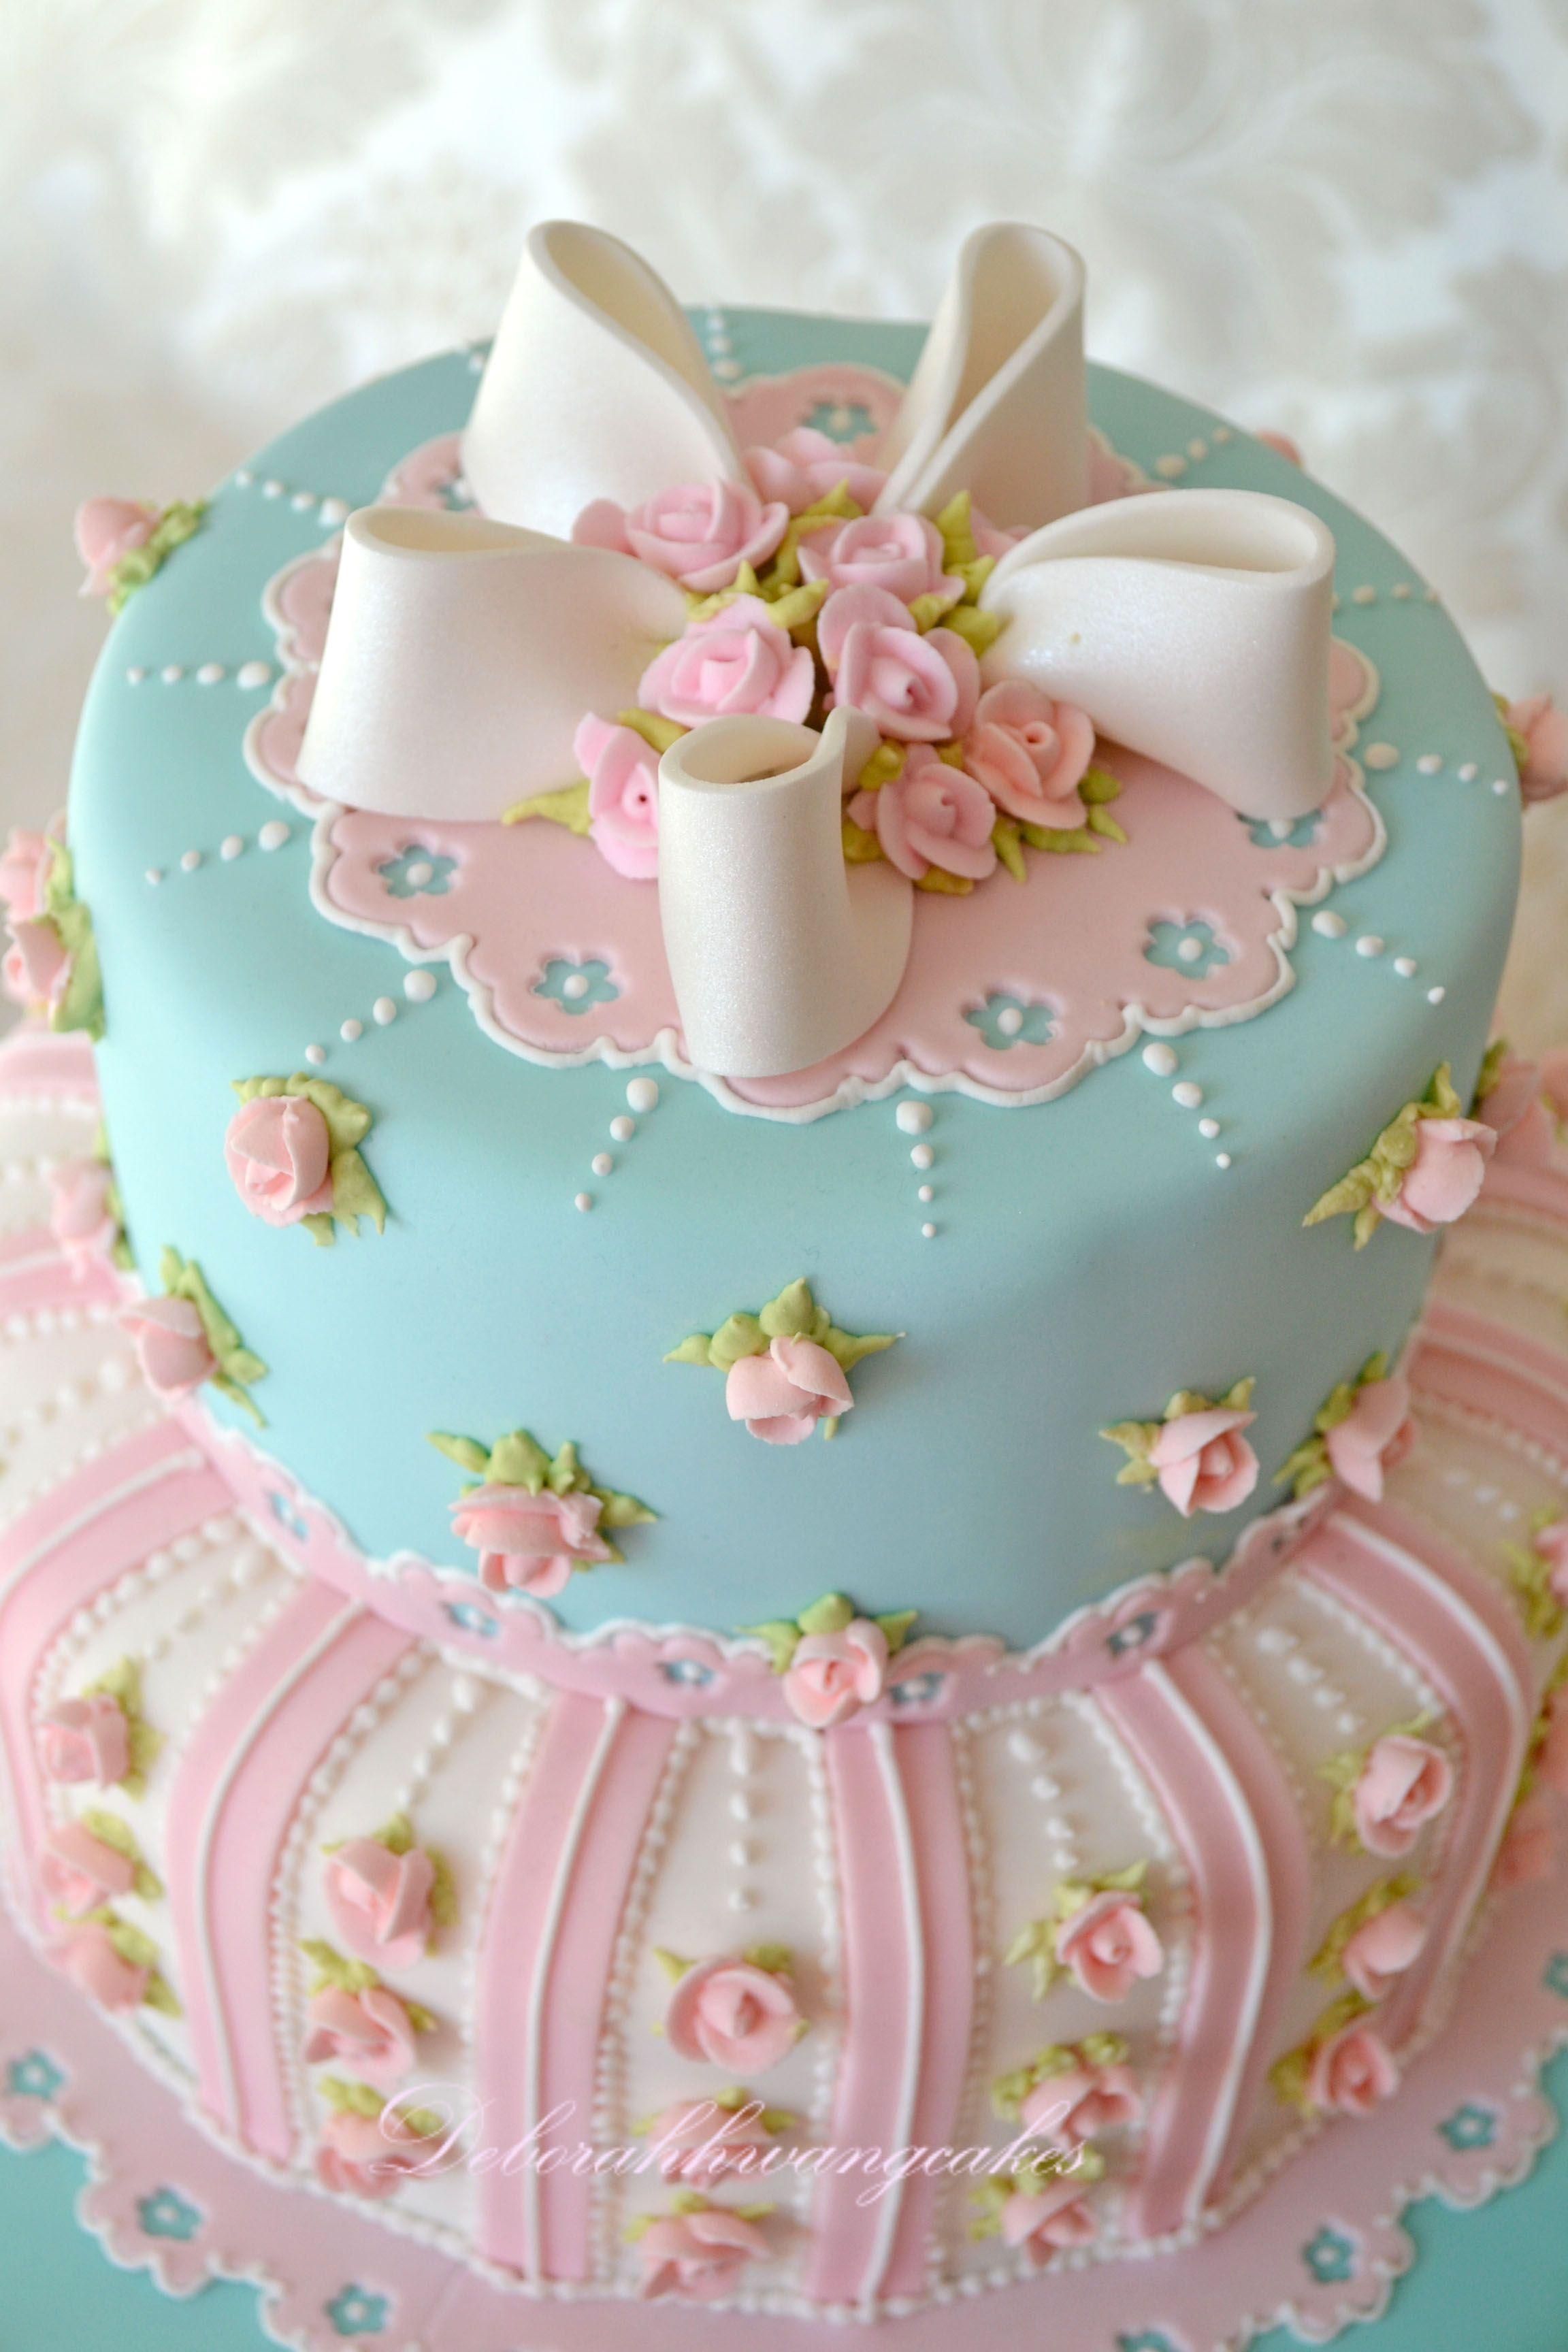 Excellent 32 Inspired Photo Of Birthday Cakes For Ladies Birijus Com Birthday Cards Printable Trancafe Filternl